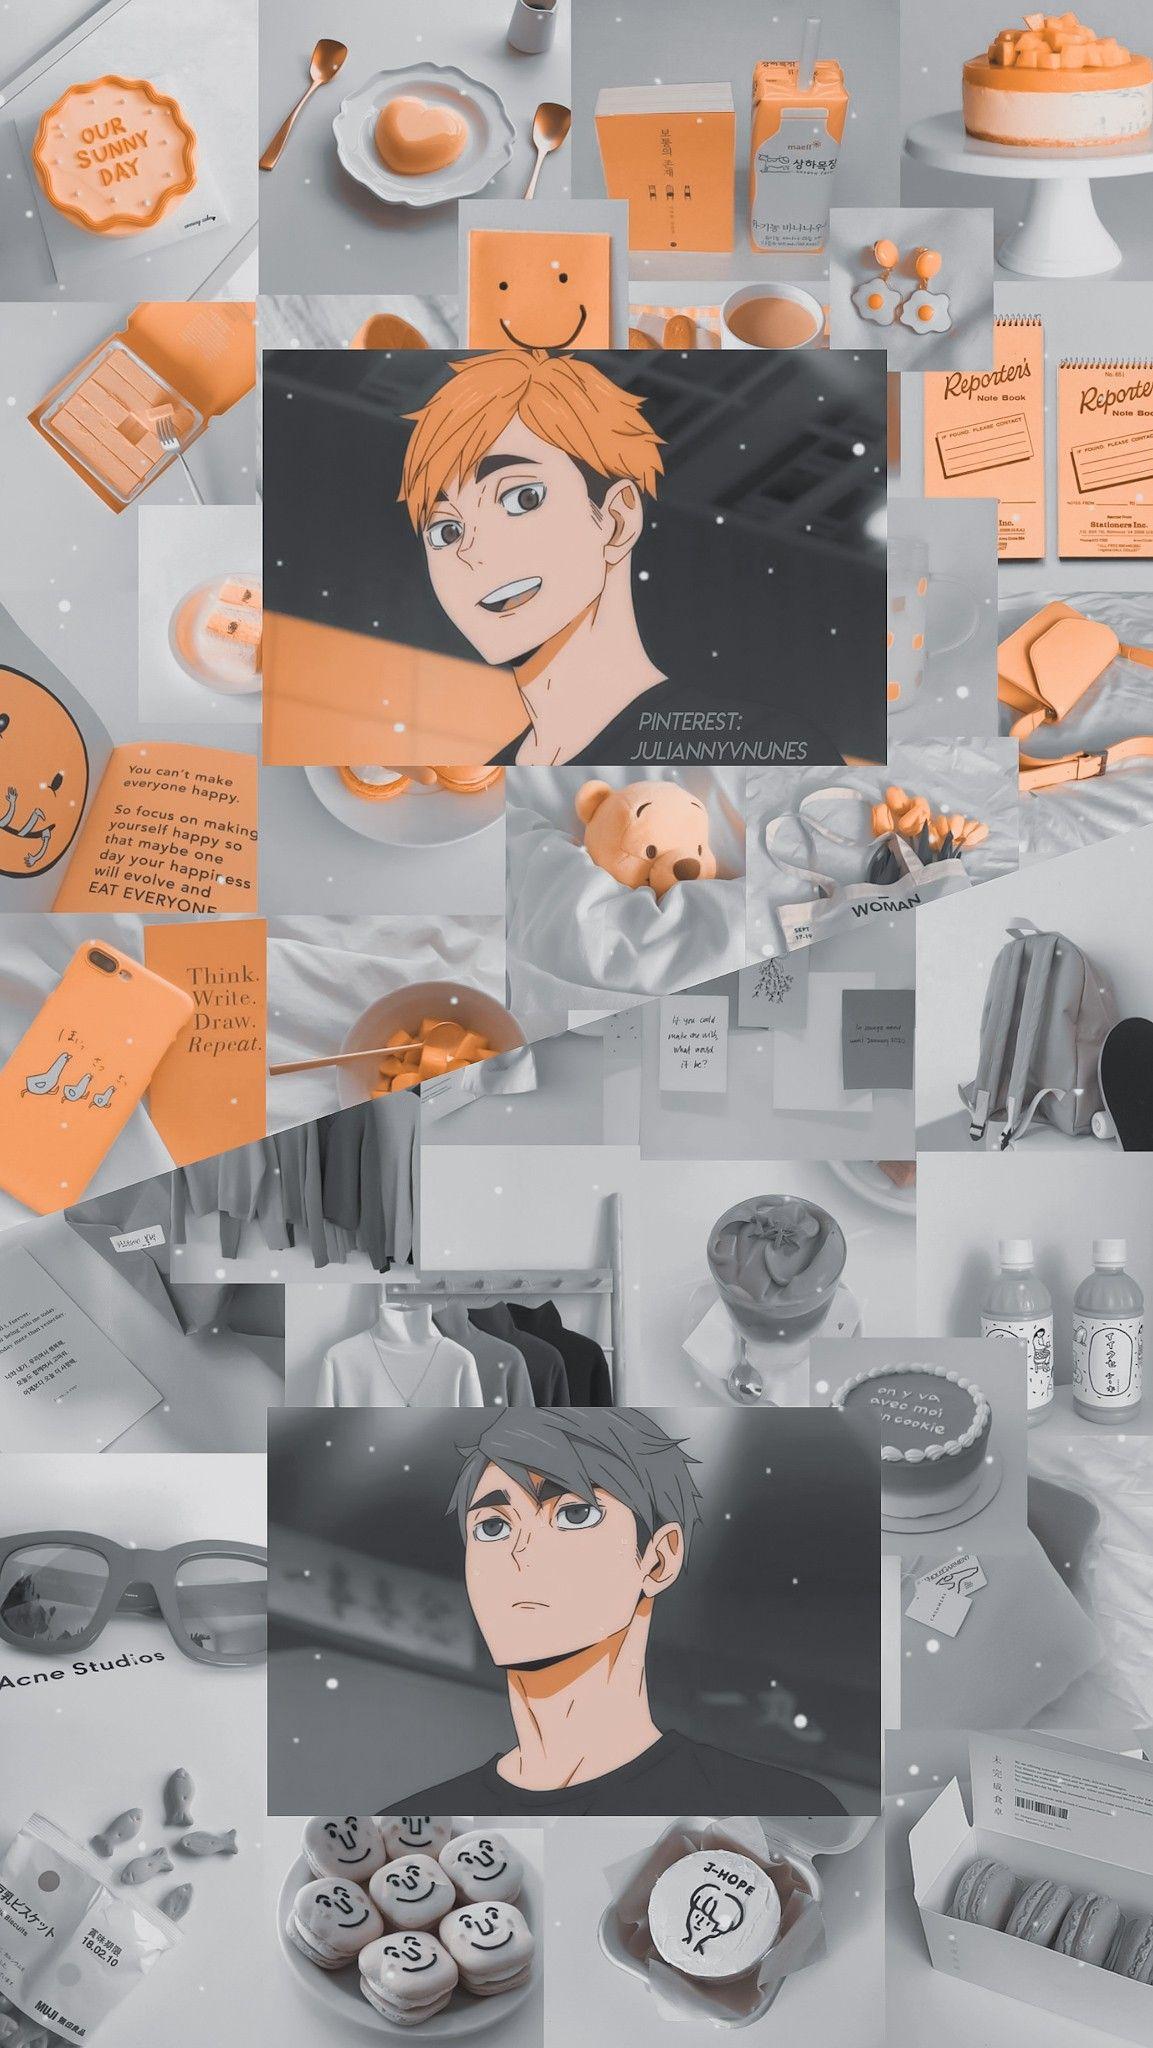 Pin By 𝗡𝗼𝗮𝗵 ૮ ﻌ ა On Fondos De Pantalla Anime Wallpaper Phone Cute Anime Wallpaper Anime Wallpaper